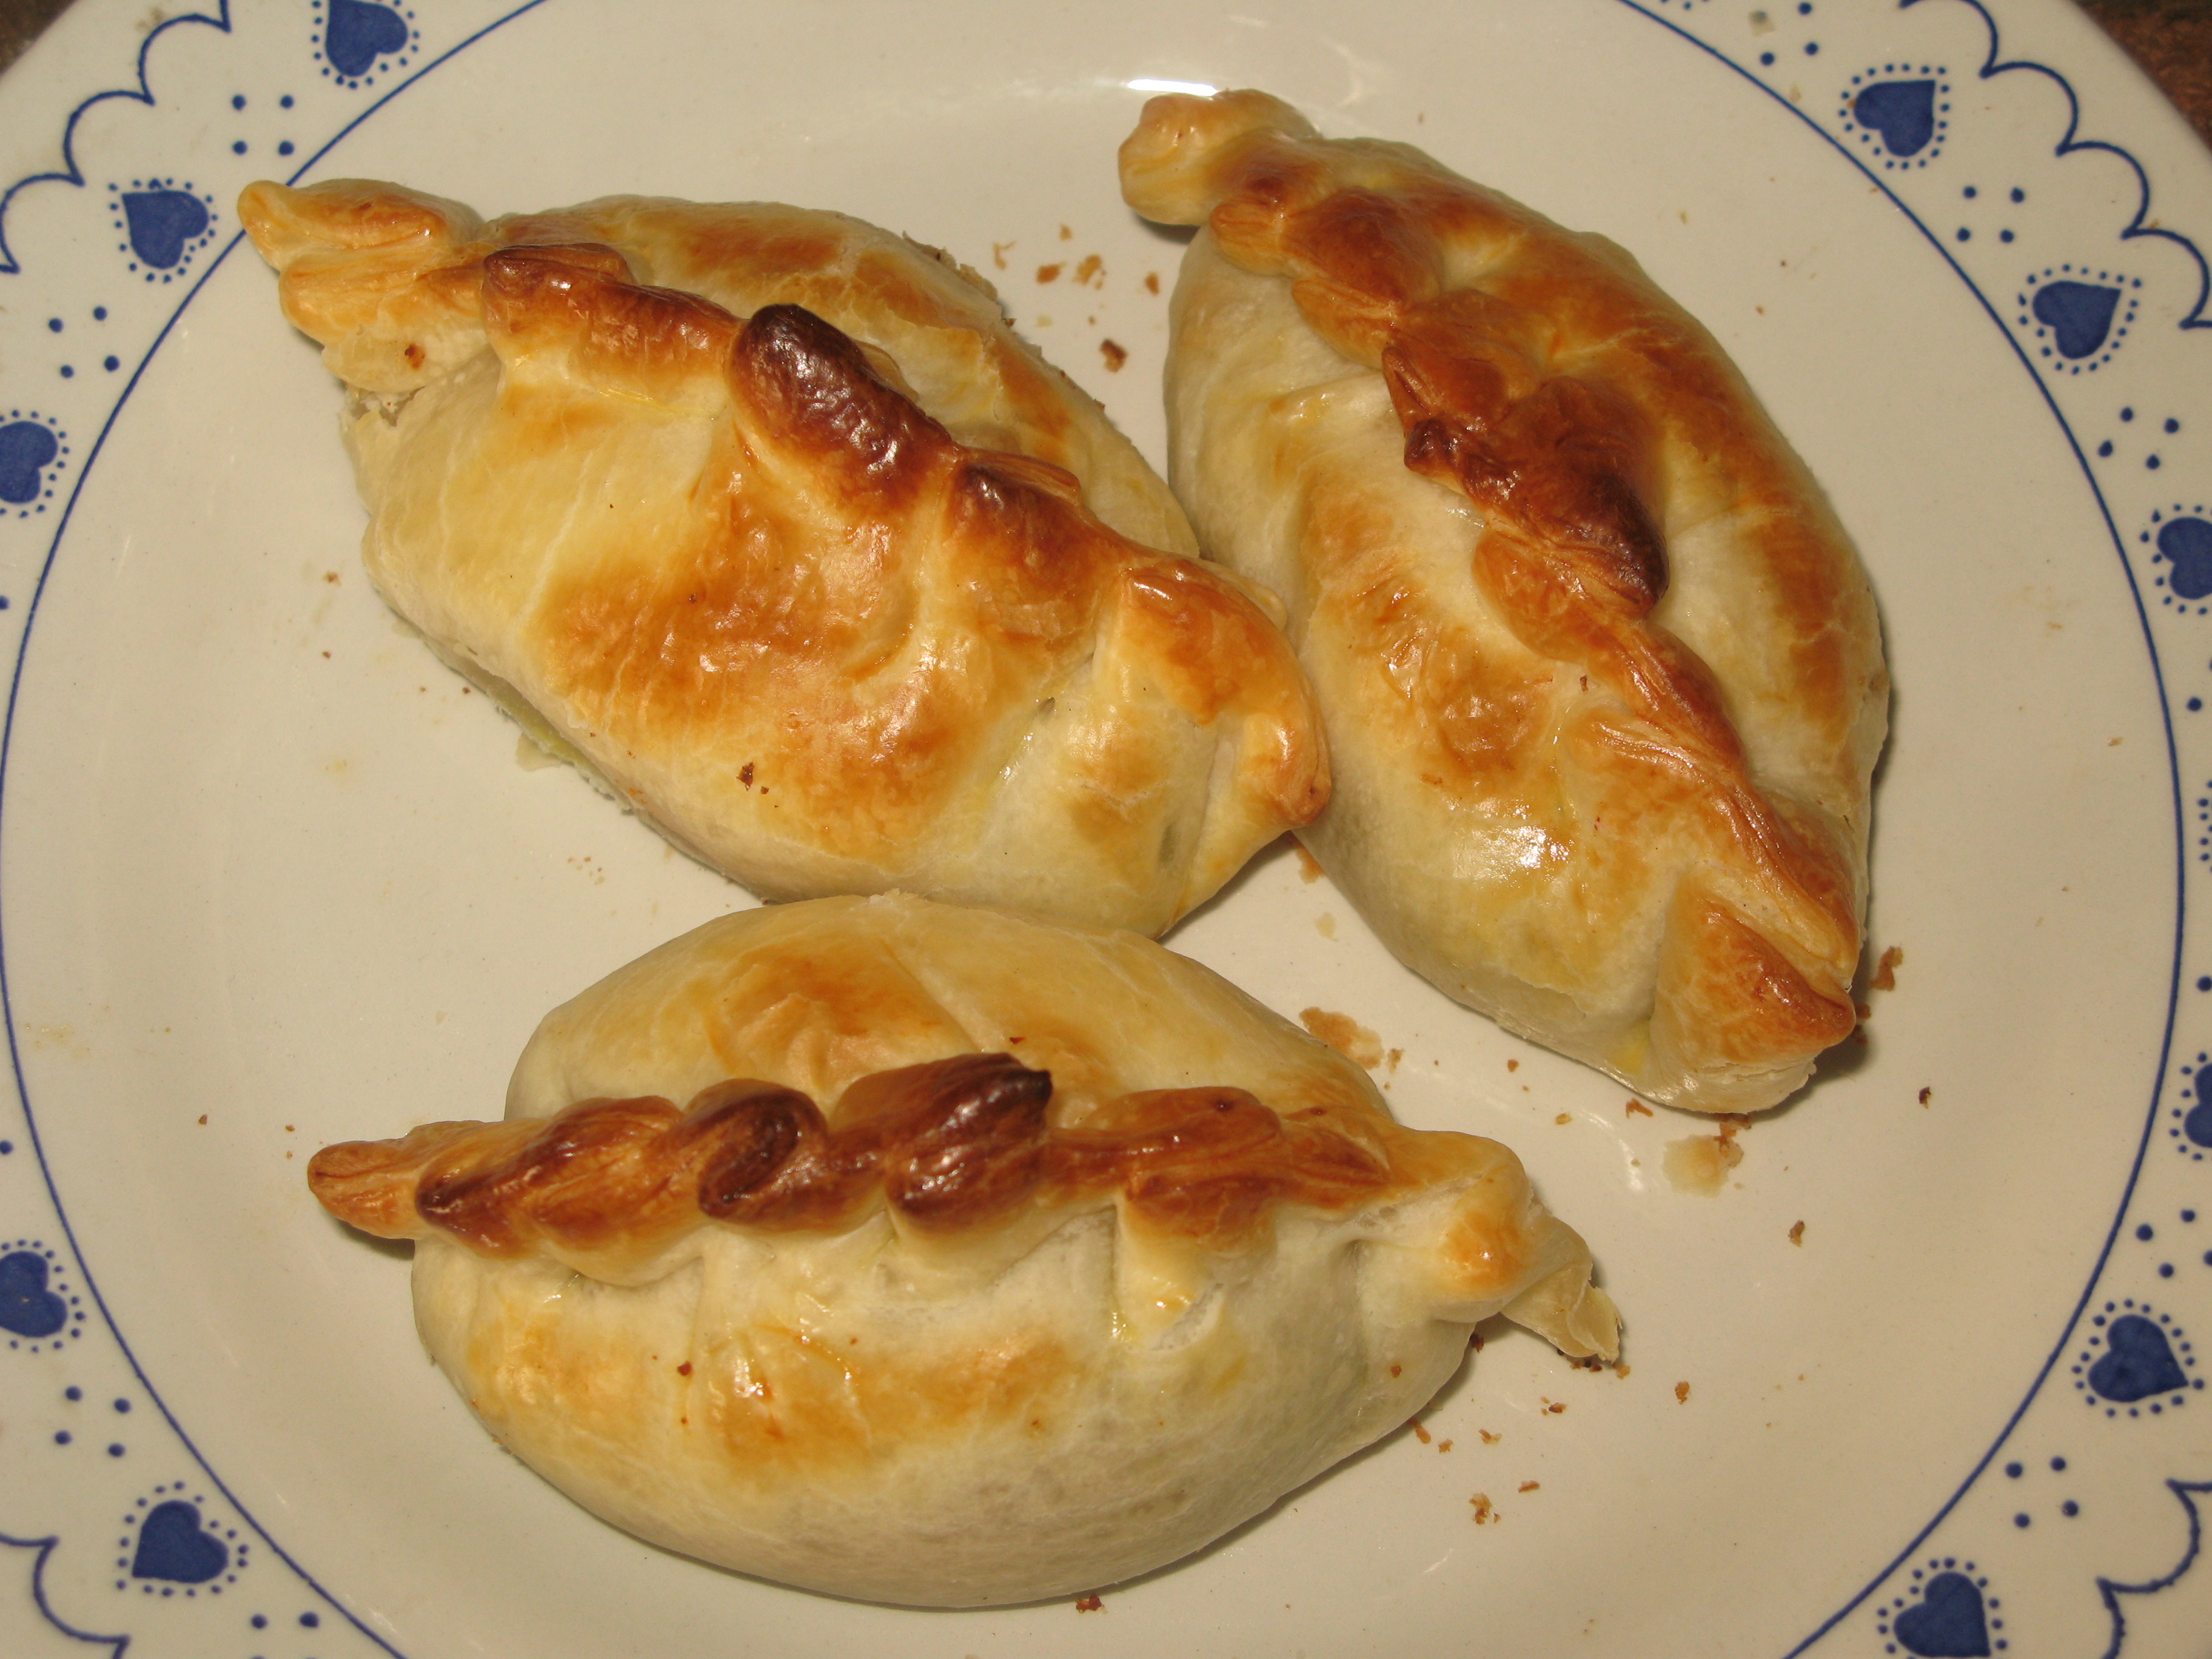 File:Empanadas cordobesas (Argentina) caseras.JPG - Wikimedia Commons